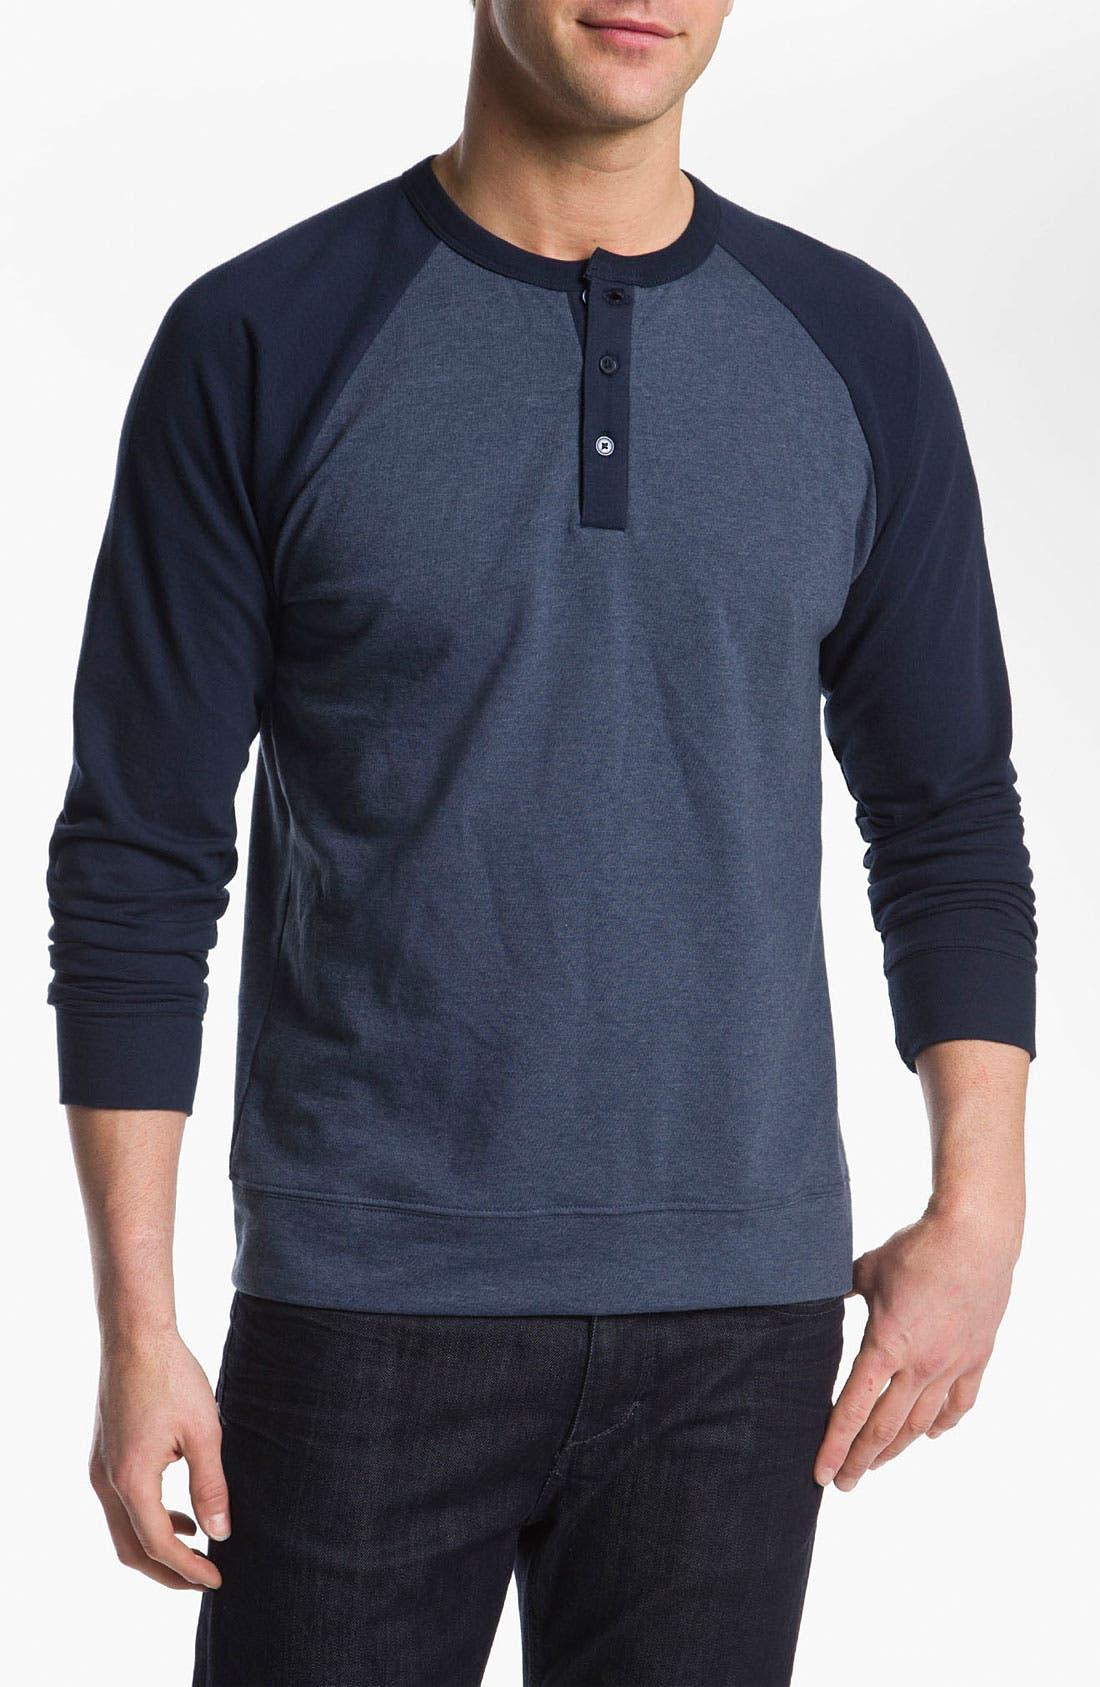 Alternate Image 1 Selected - Obey 'Schmidt' Raglan Sleeve Henley Sweatshirt